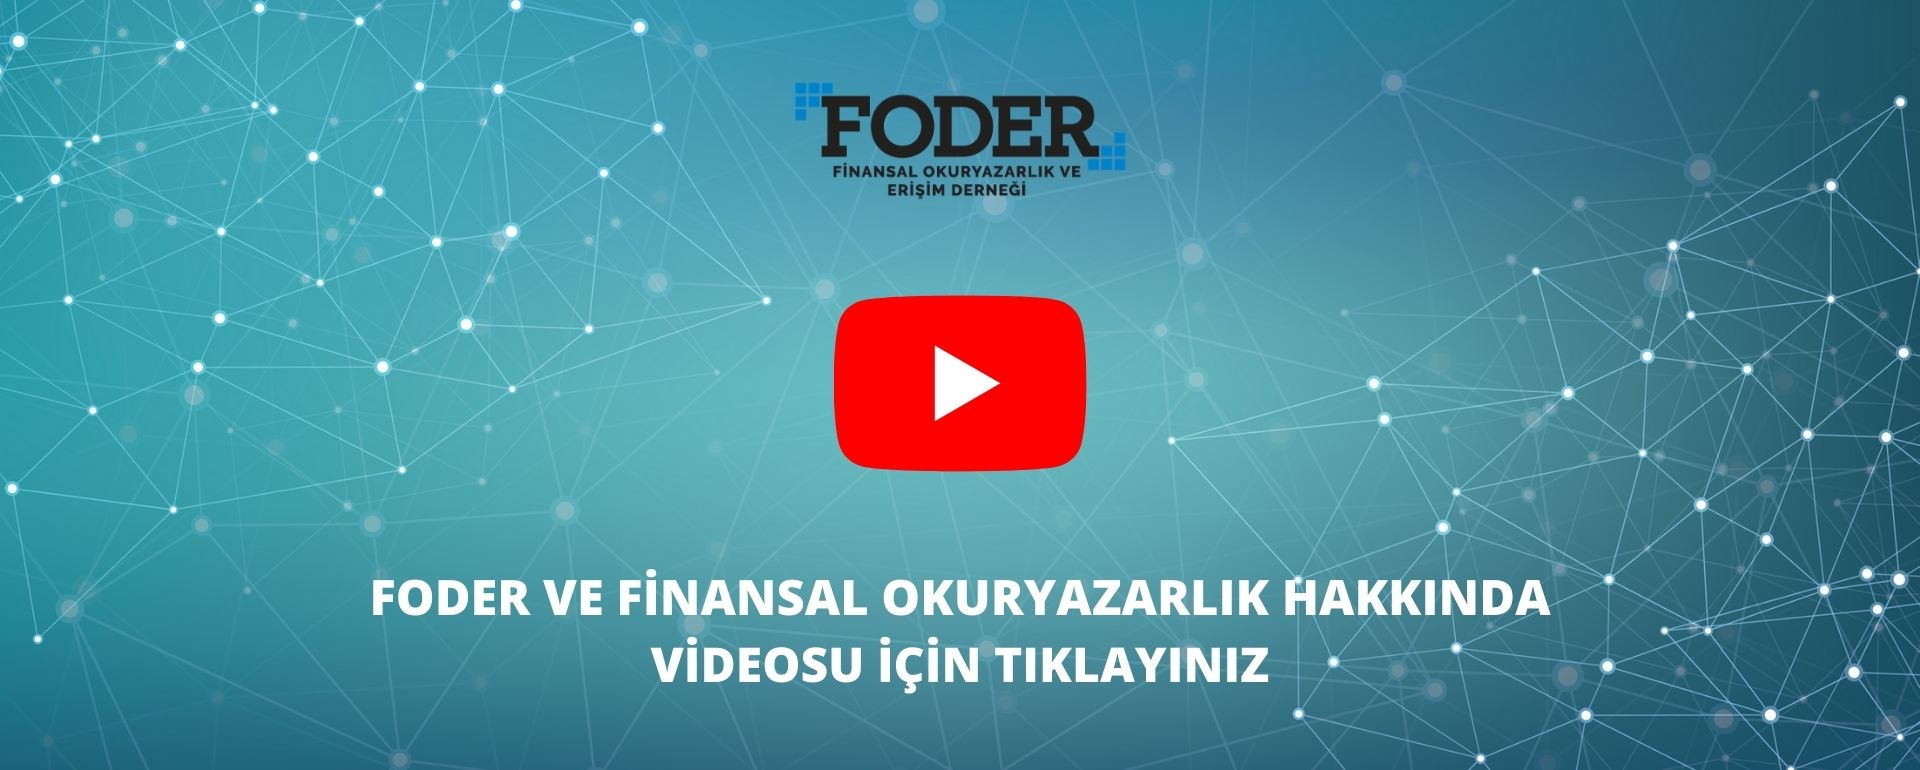 anasayfa video